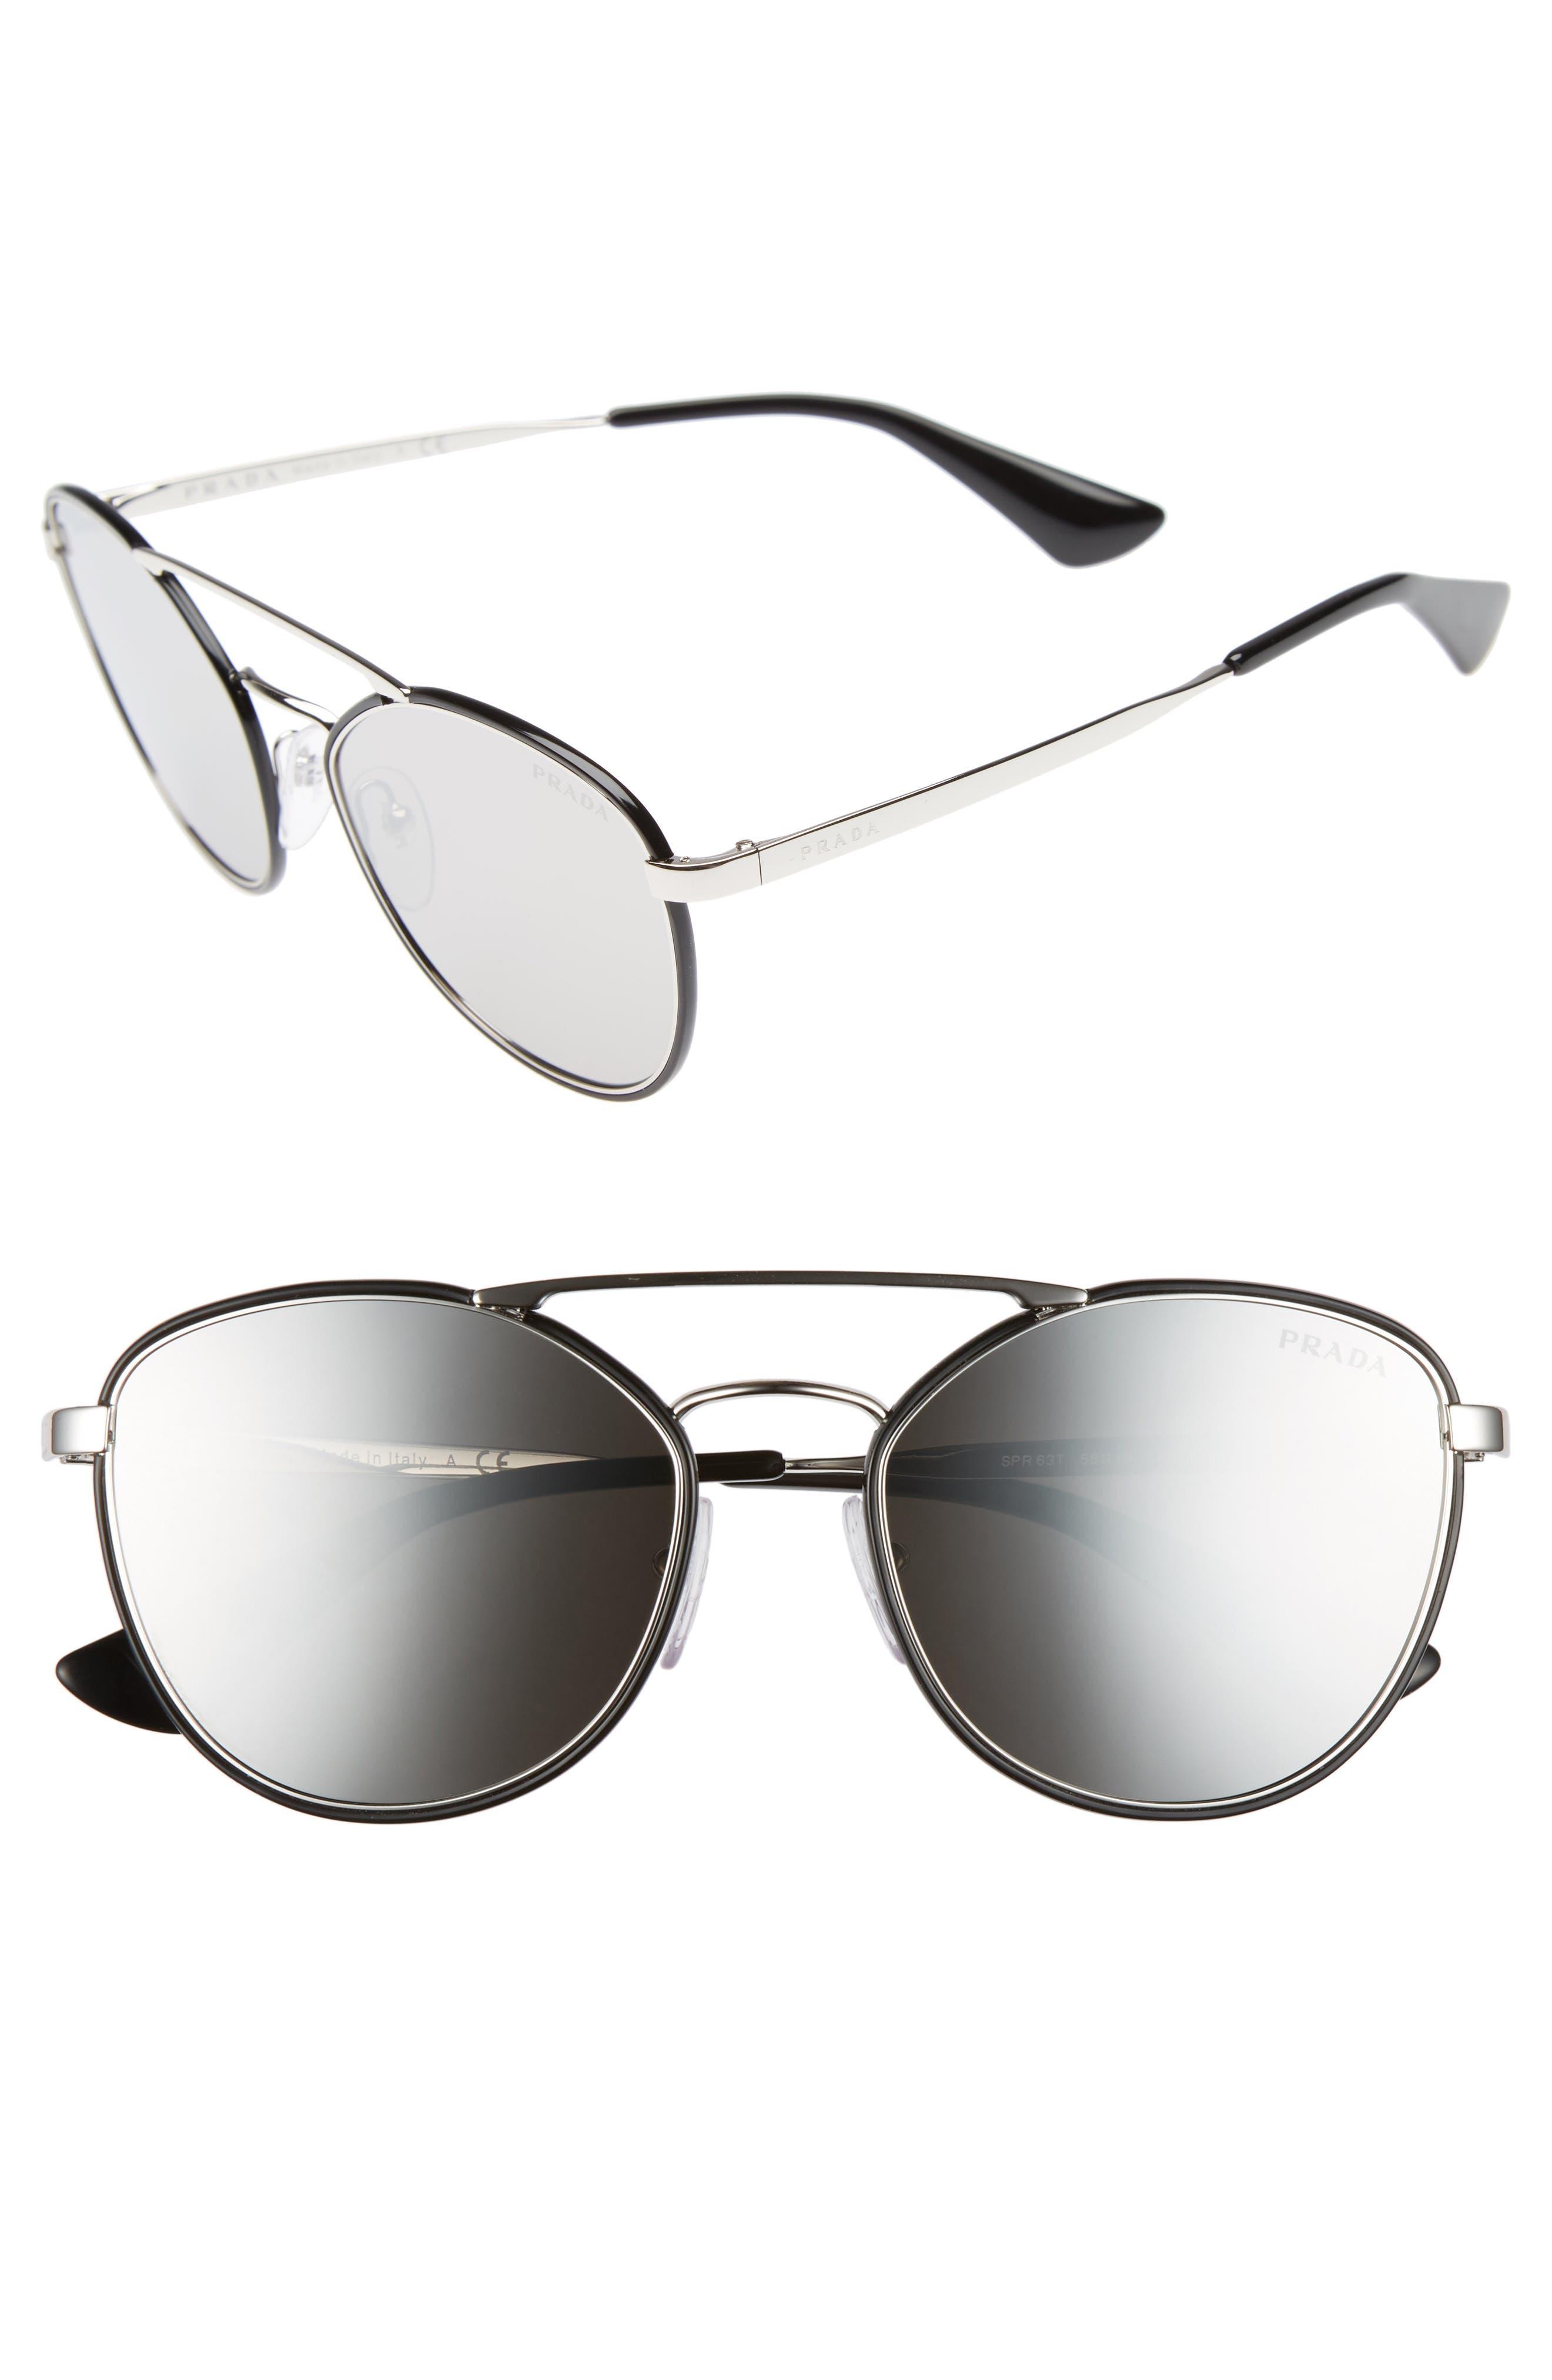 55mm Mirrored Aviator Sunglasses,                             Main thumbnail 1, color,                             001